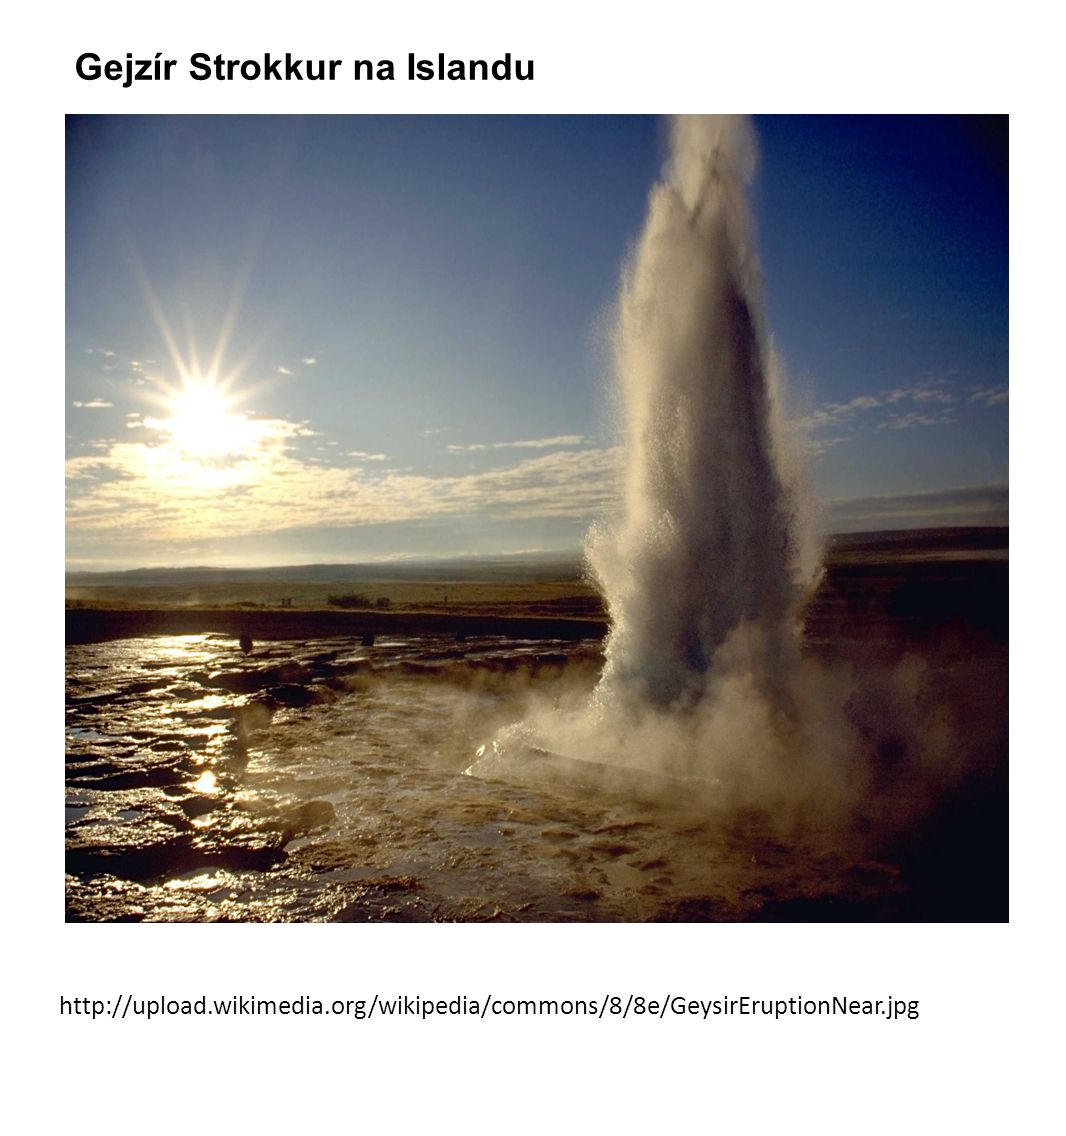 http://upload.wikimedia.org/wikipedia/commons/8/8e/GeysirEruptionNear.jpg Gejzír Strokkur na Islandu